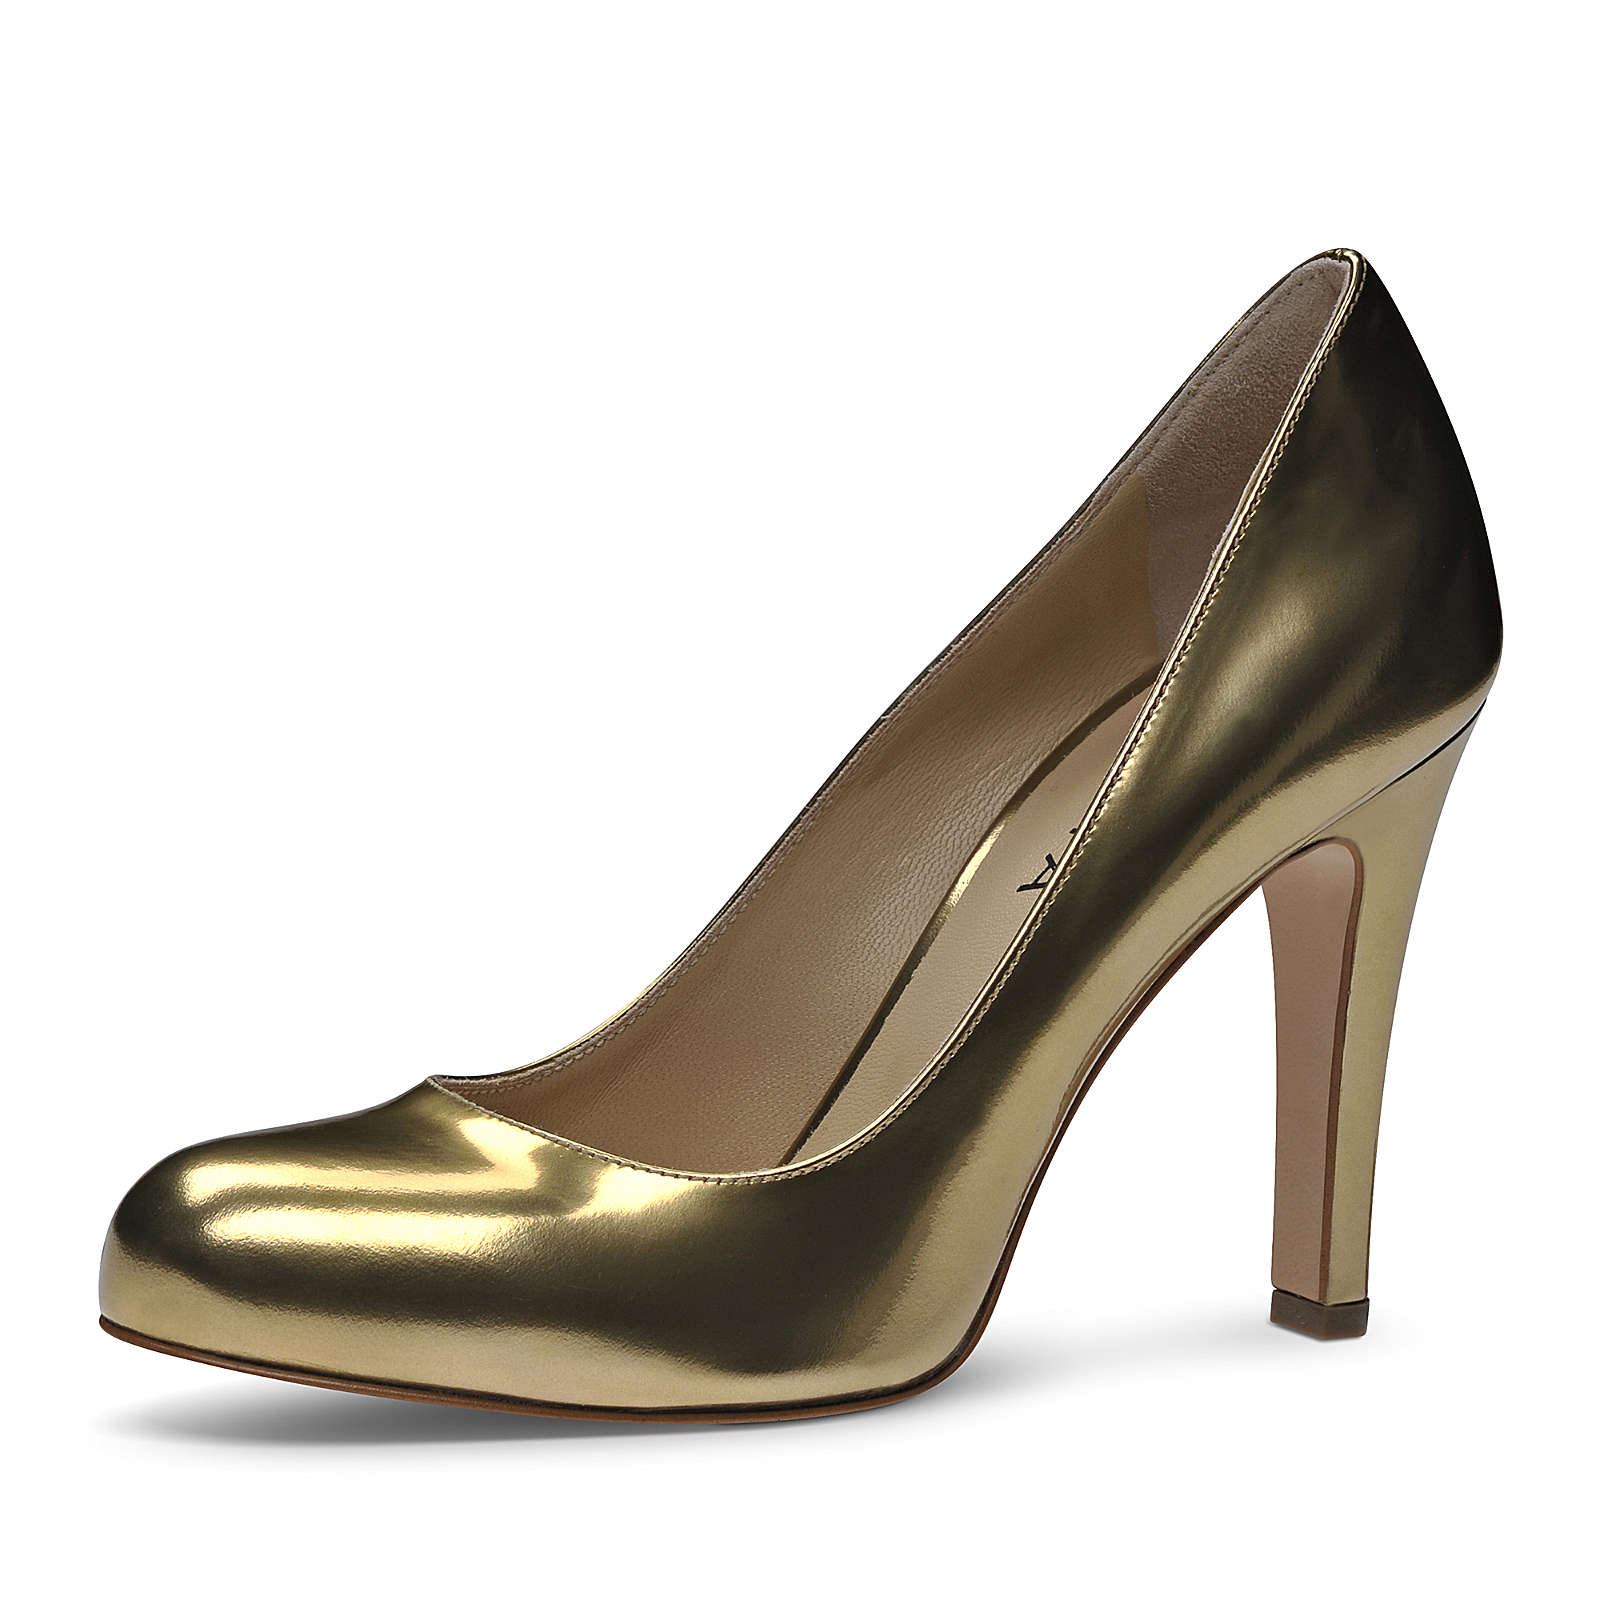 Evita Shoes Pumps gold Damen Gr. 37